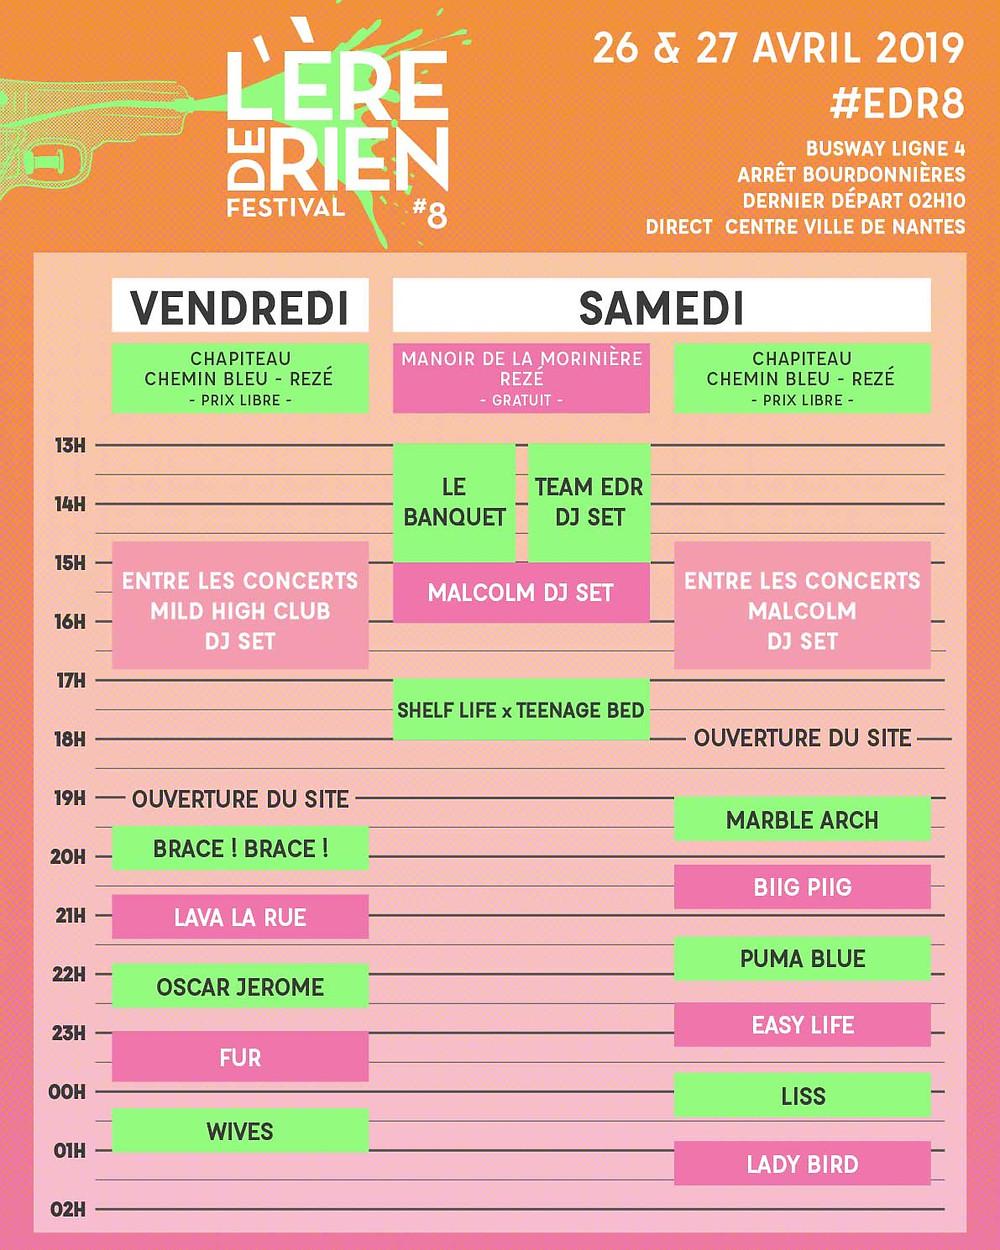 programmation_2019_festival_lere_de_rien